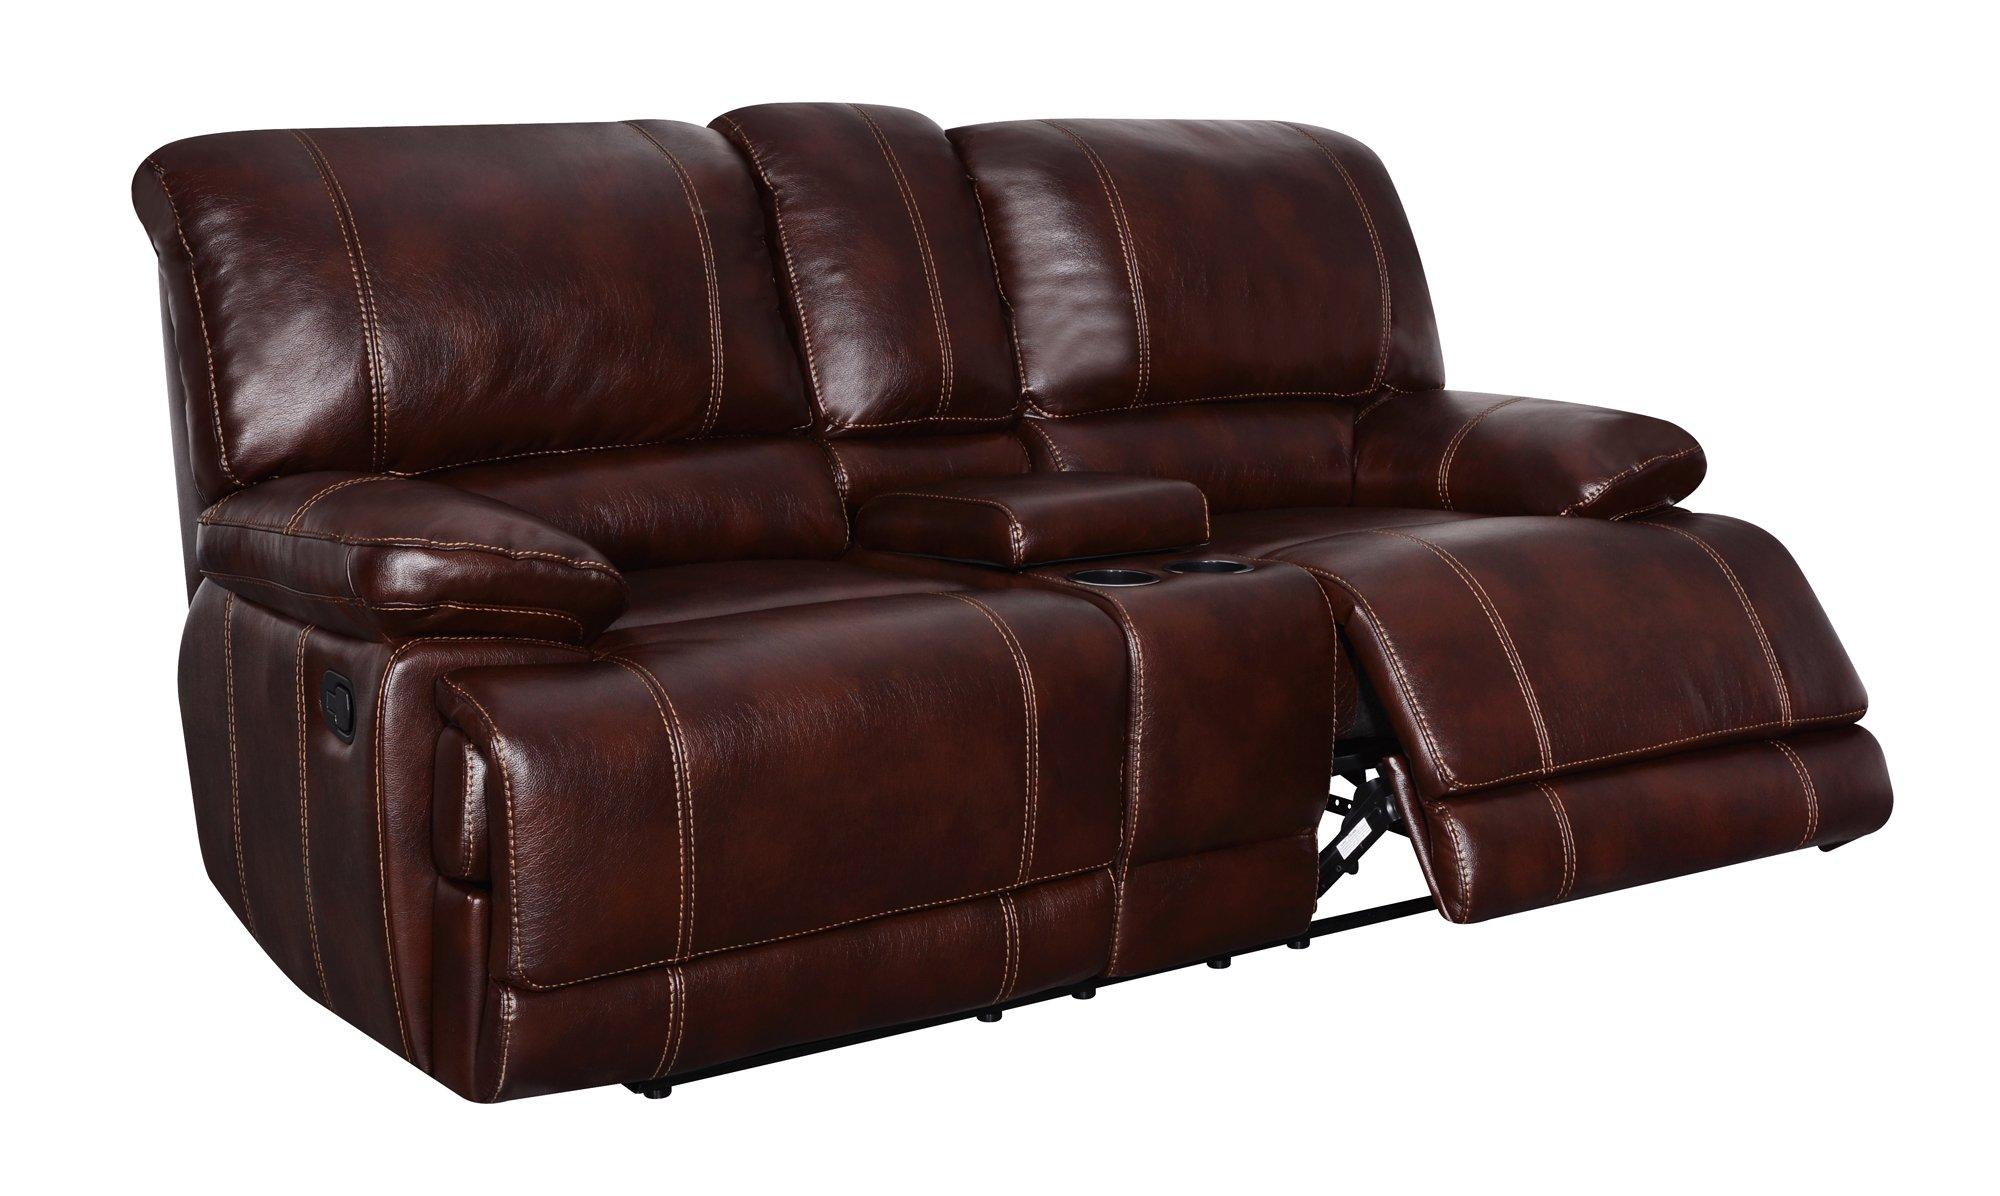 u1953 coffee leather gel console reclining loveseat by